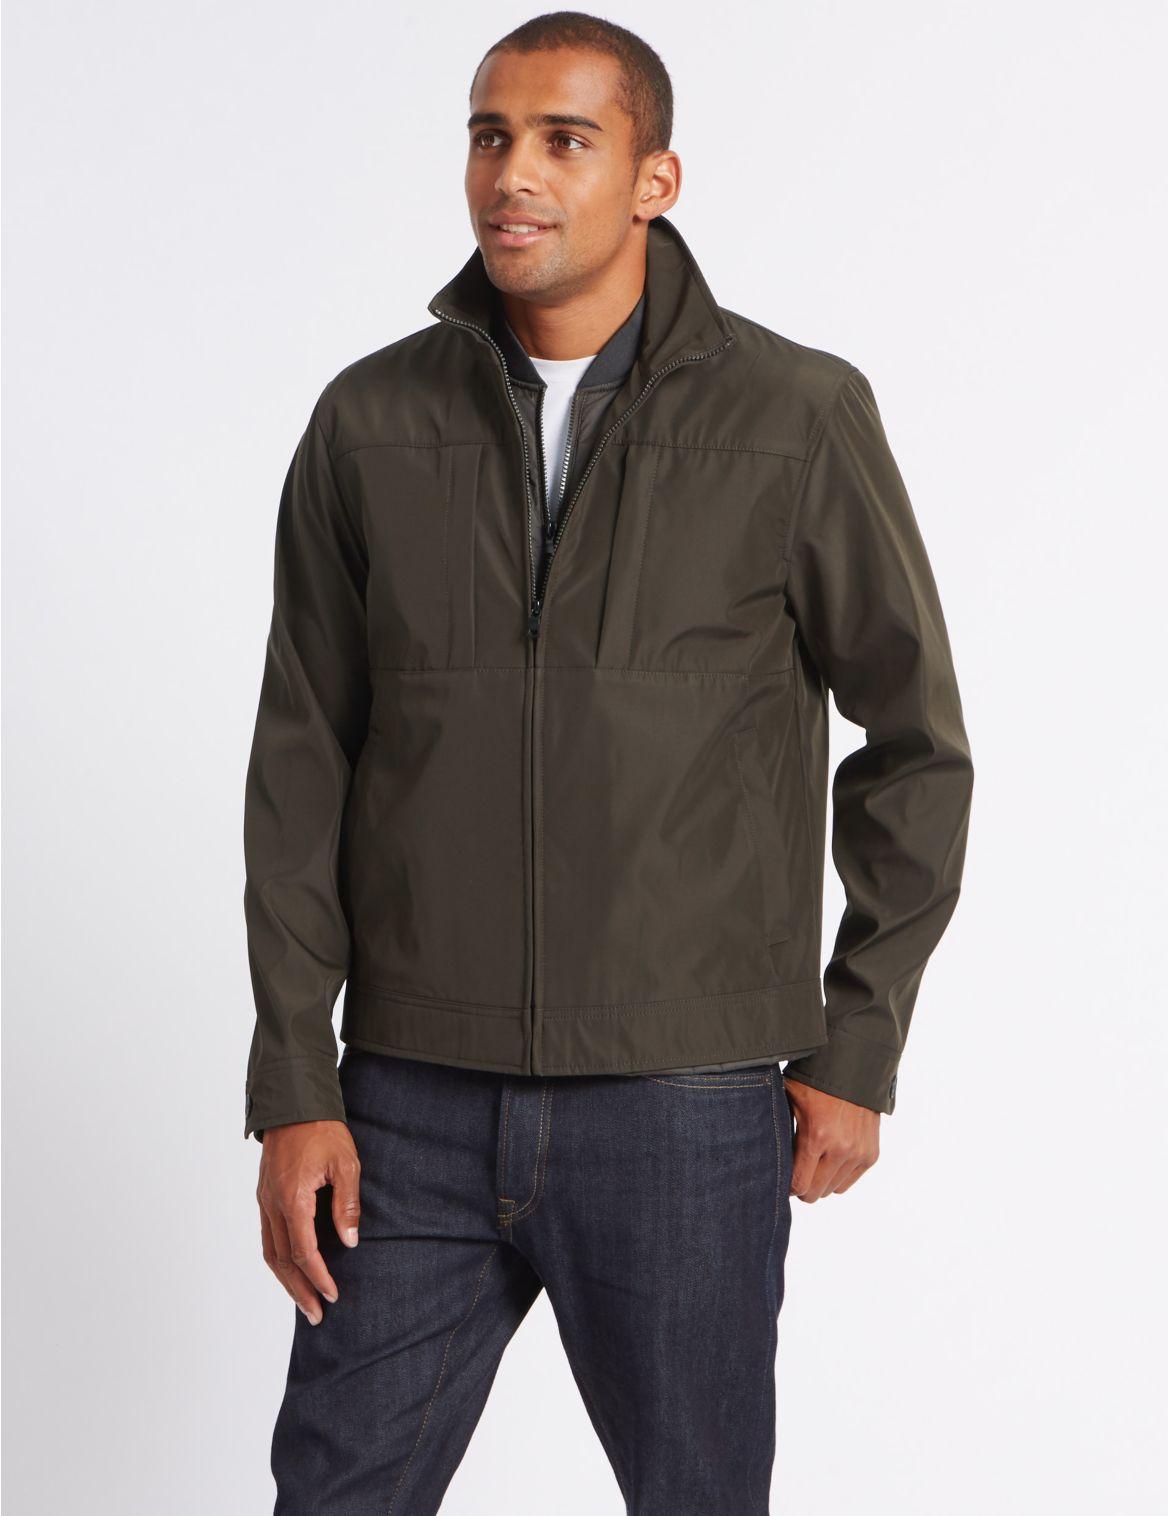 Veste Harrington 3en1, dotée de la technologie Stormwear™